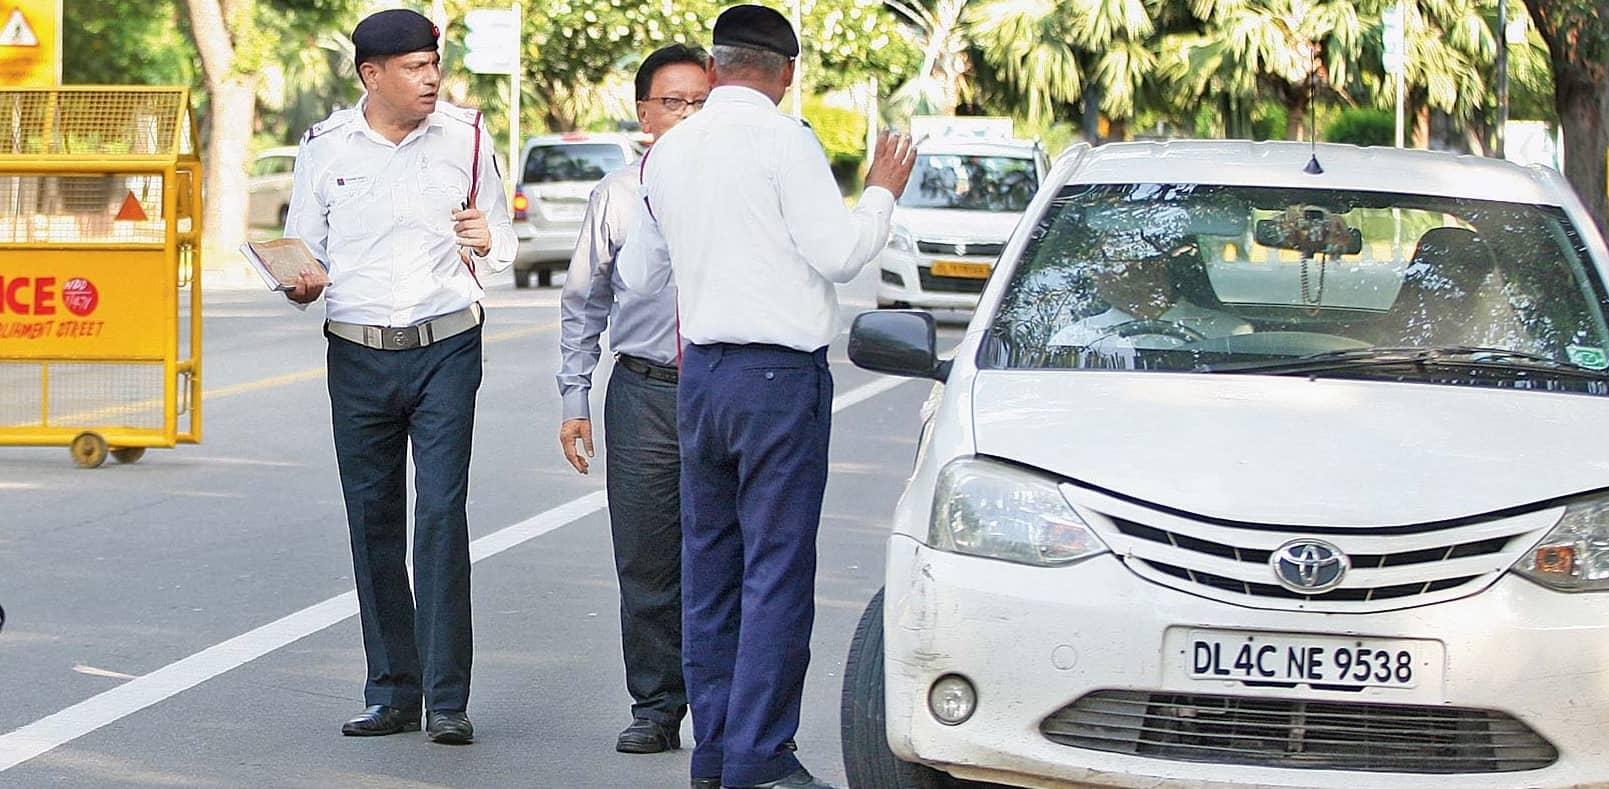 Scramble for Licence, Touts Make a Killing